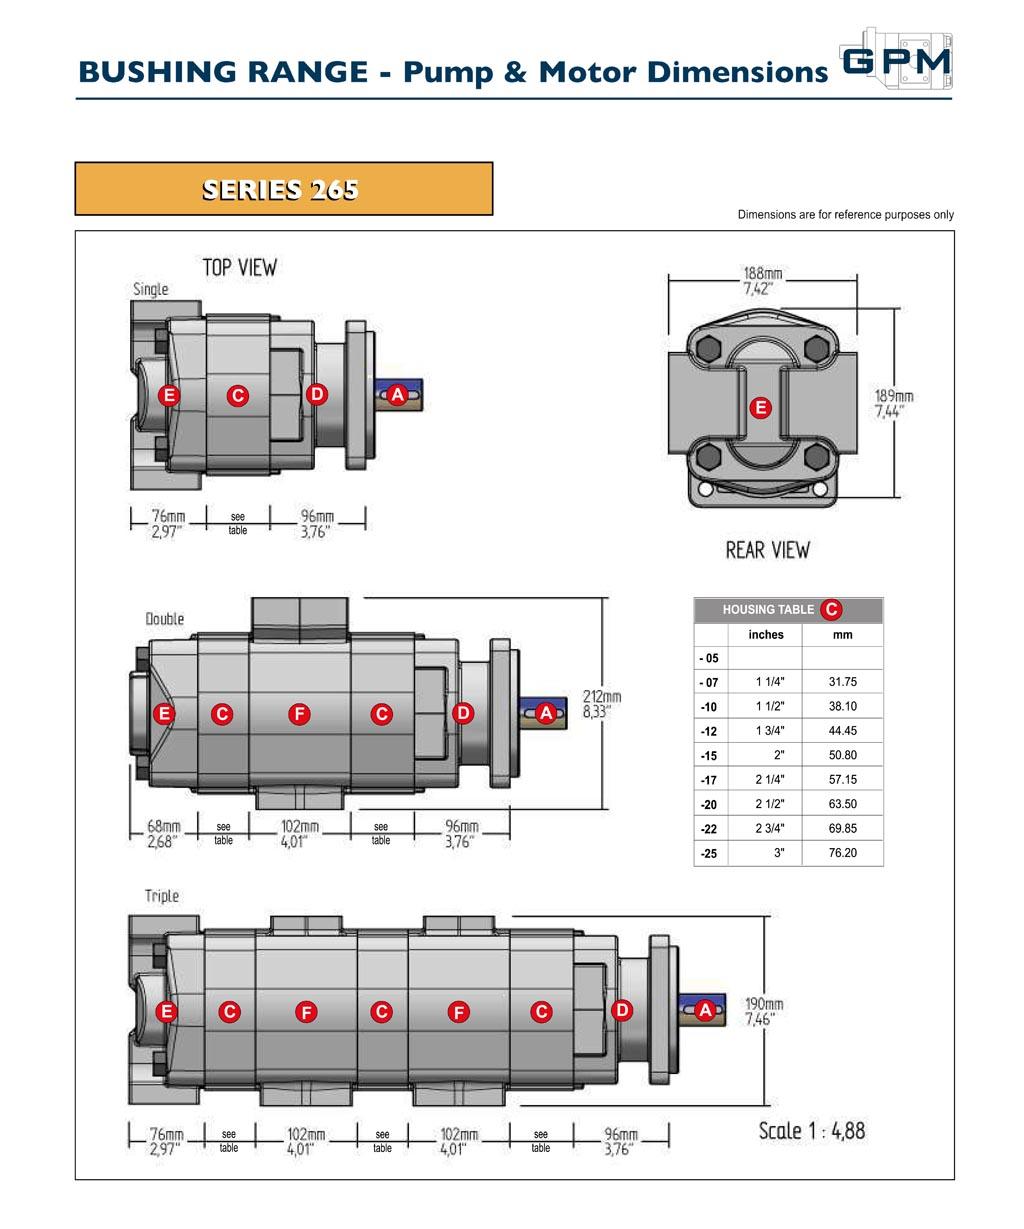 GPM Bushing Pump & Motor Dimensions-4